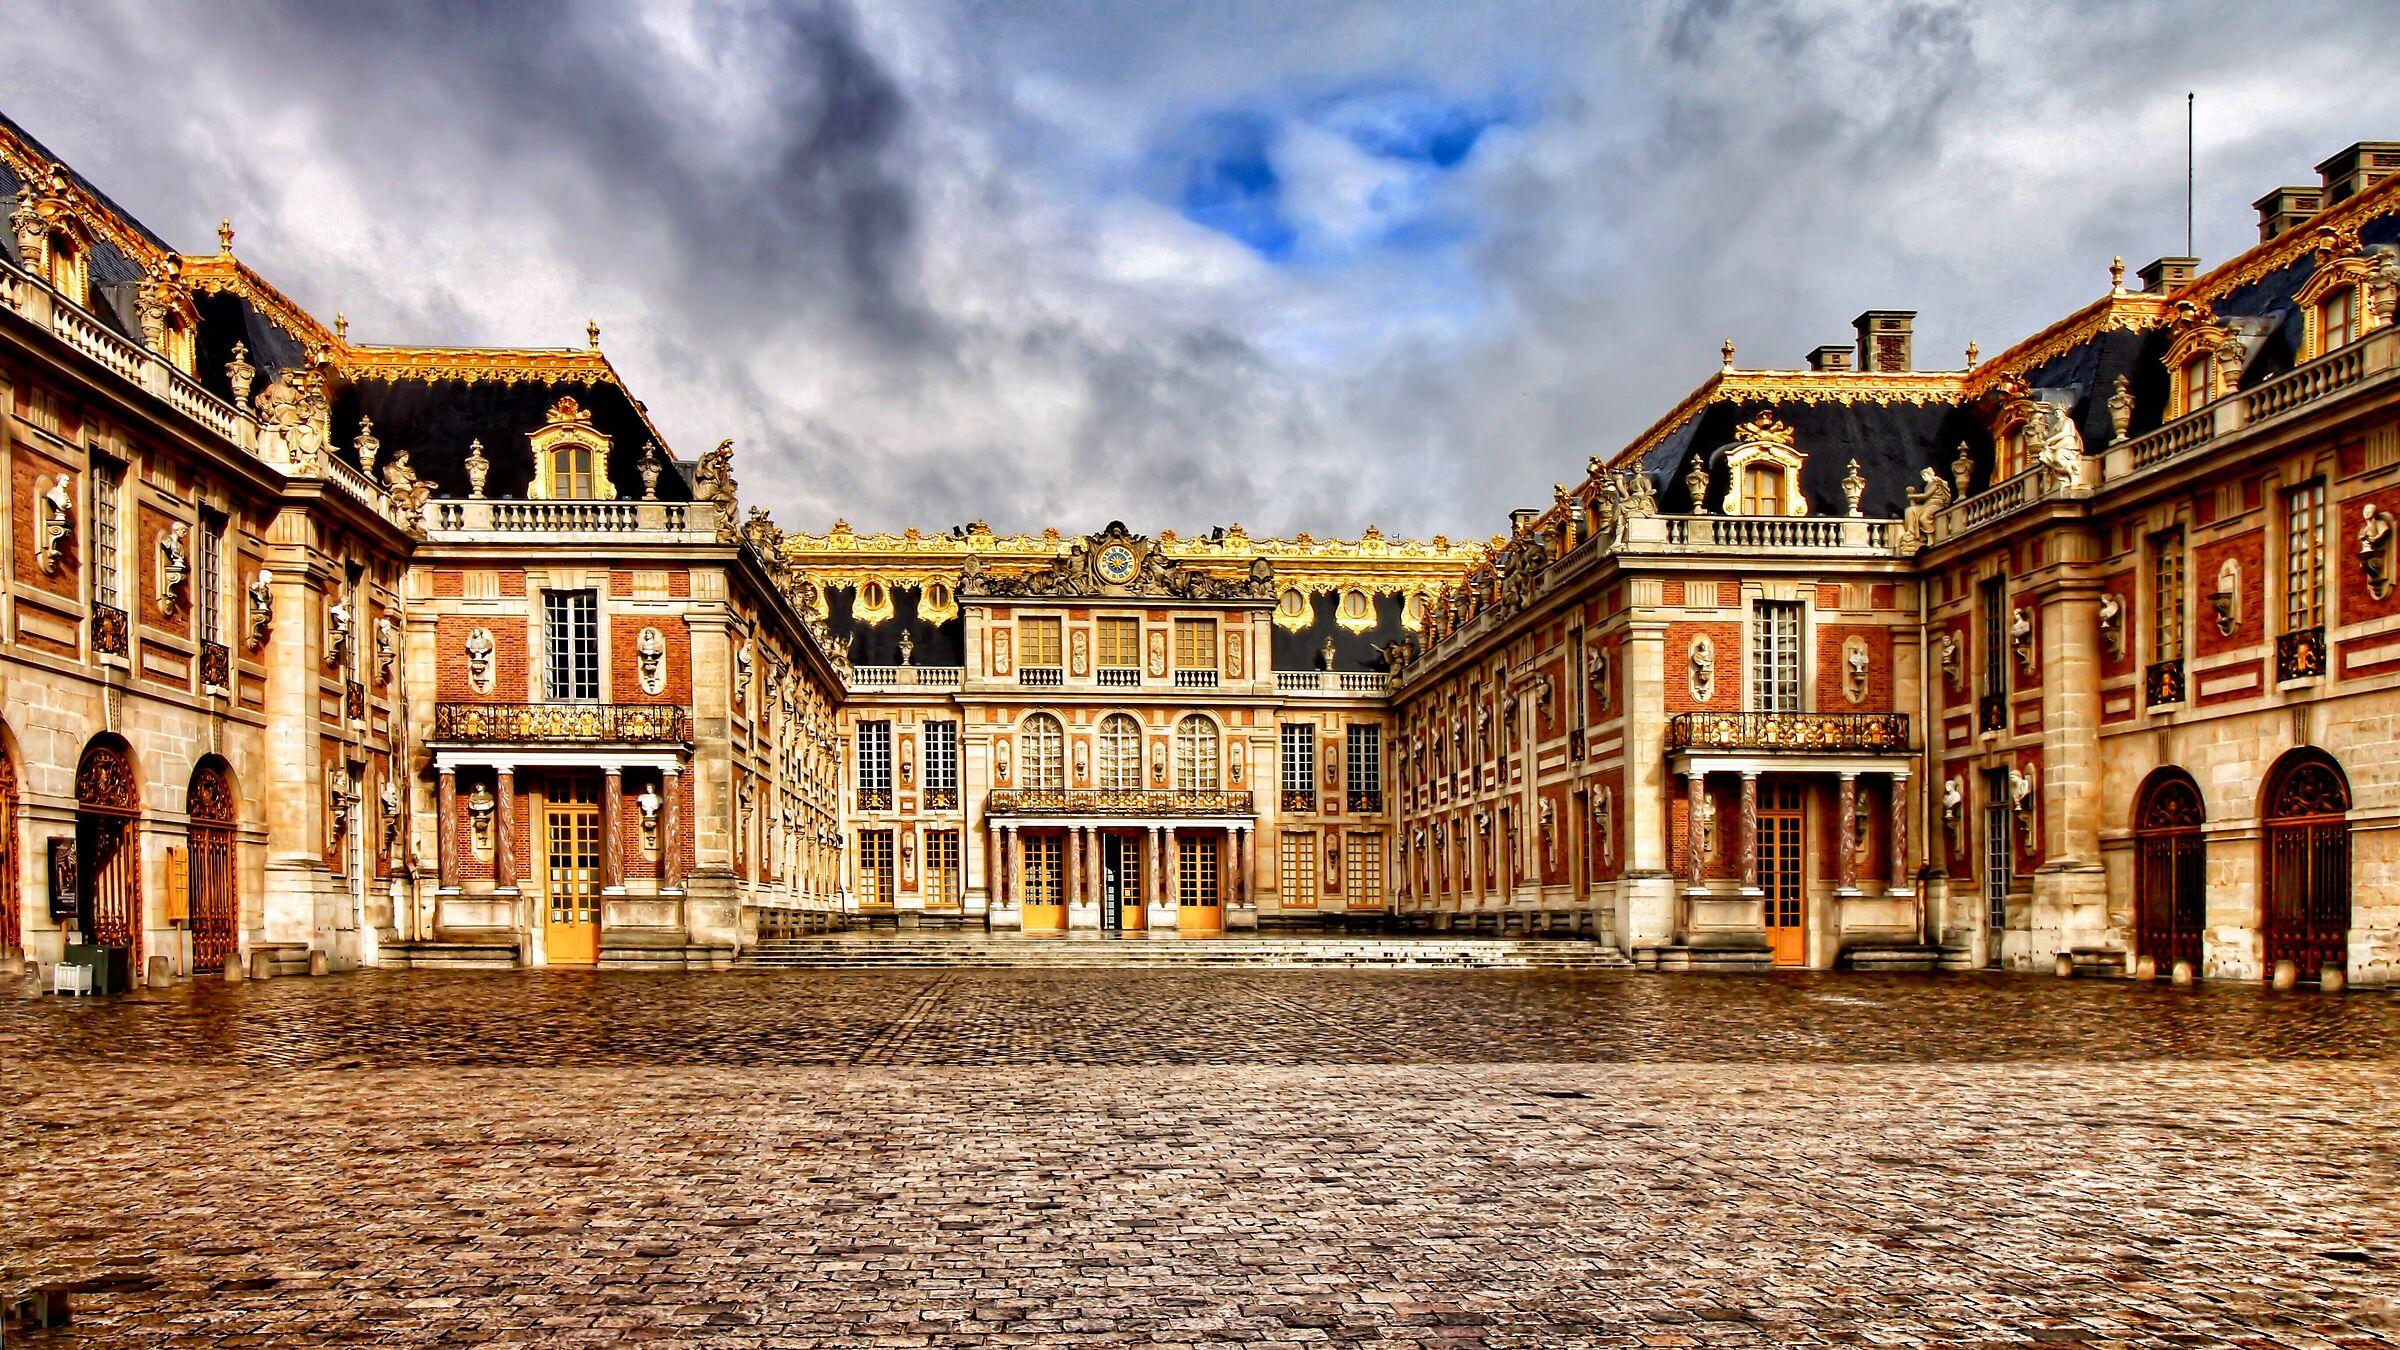 Château de Versailles. Cortile interno....